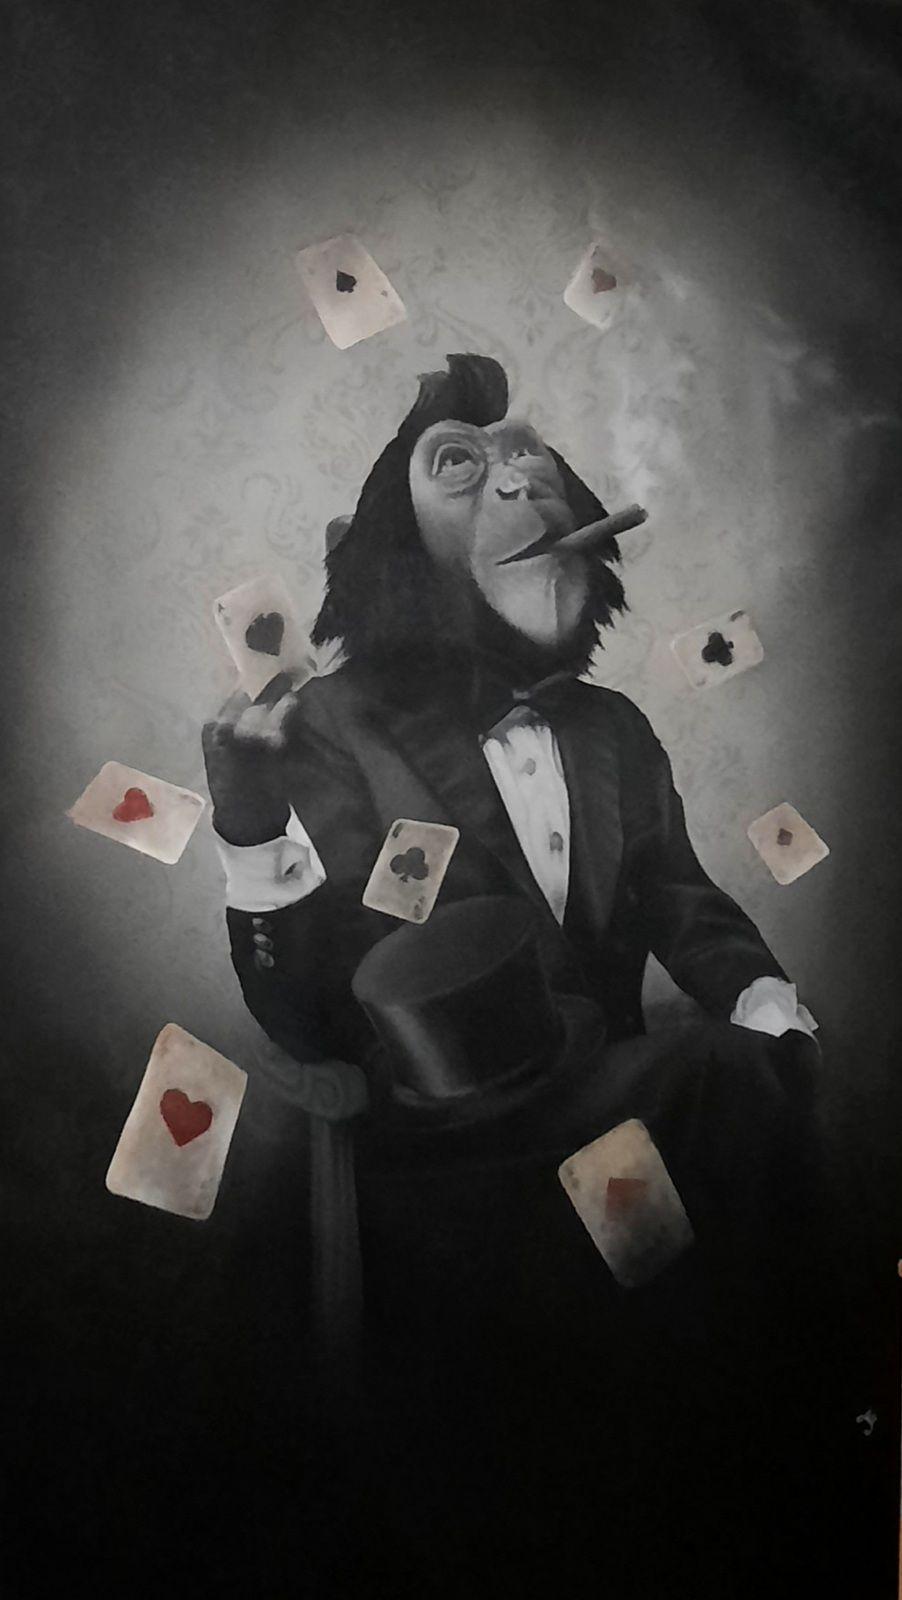 Créartaly, Sylvain binet, singe, poker